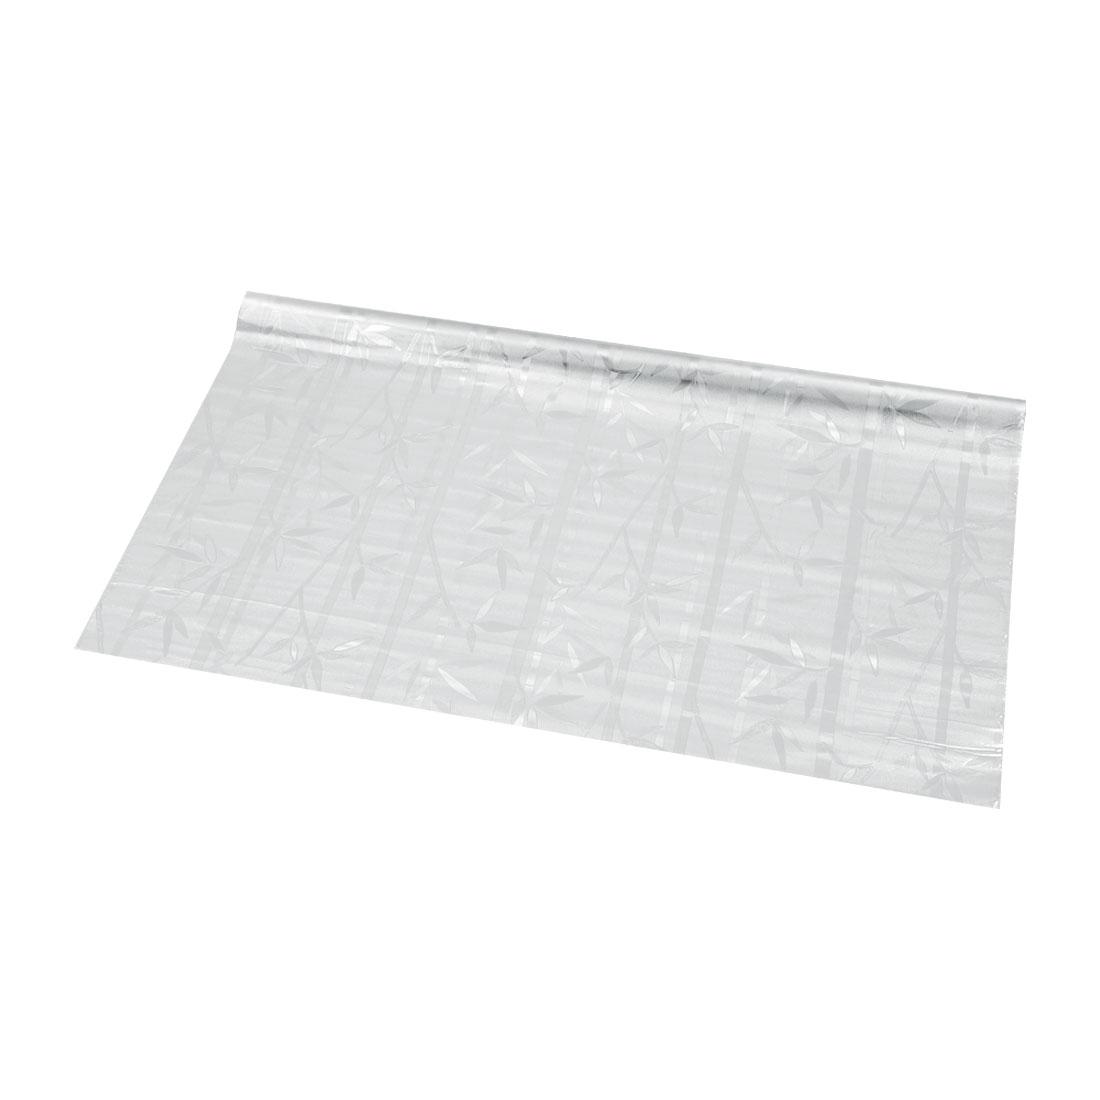 "Bathroom Home PVC 35.4"" x 78.7"" Anti UV Window Film Sticker Bamboo Pattern"